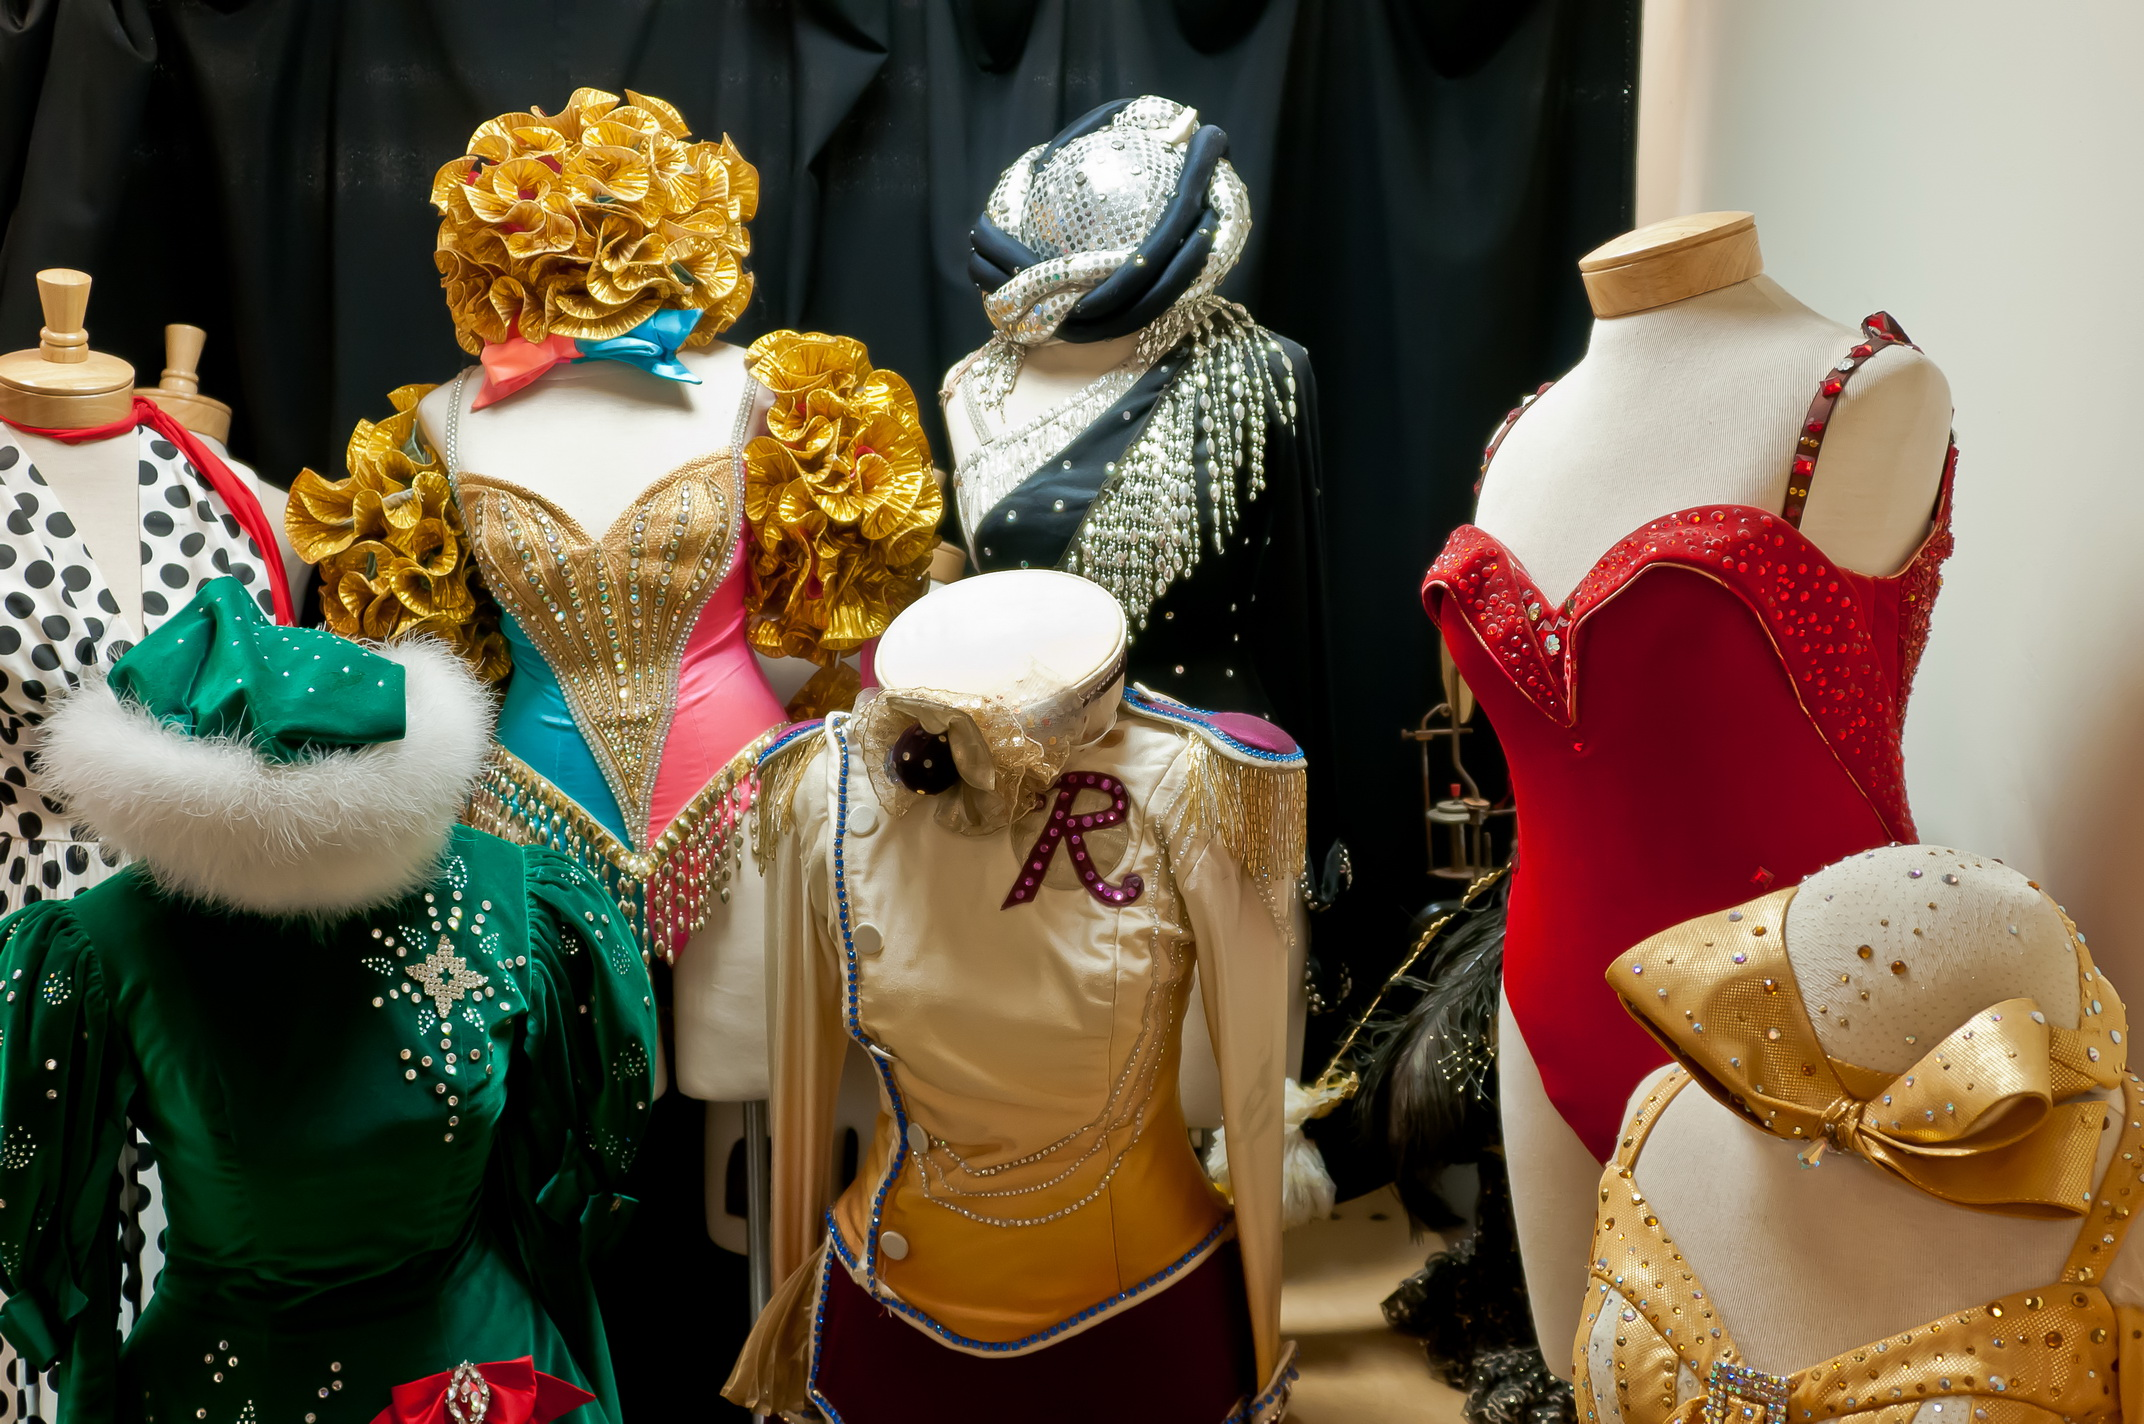 2036_Radio City Music Hall backstage costumes